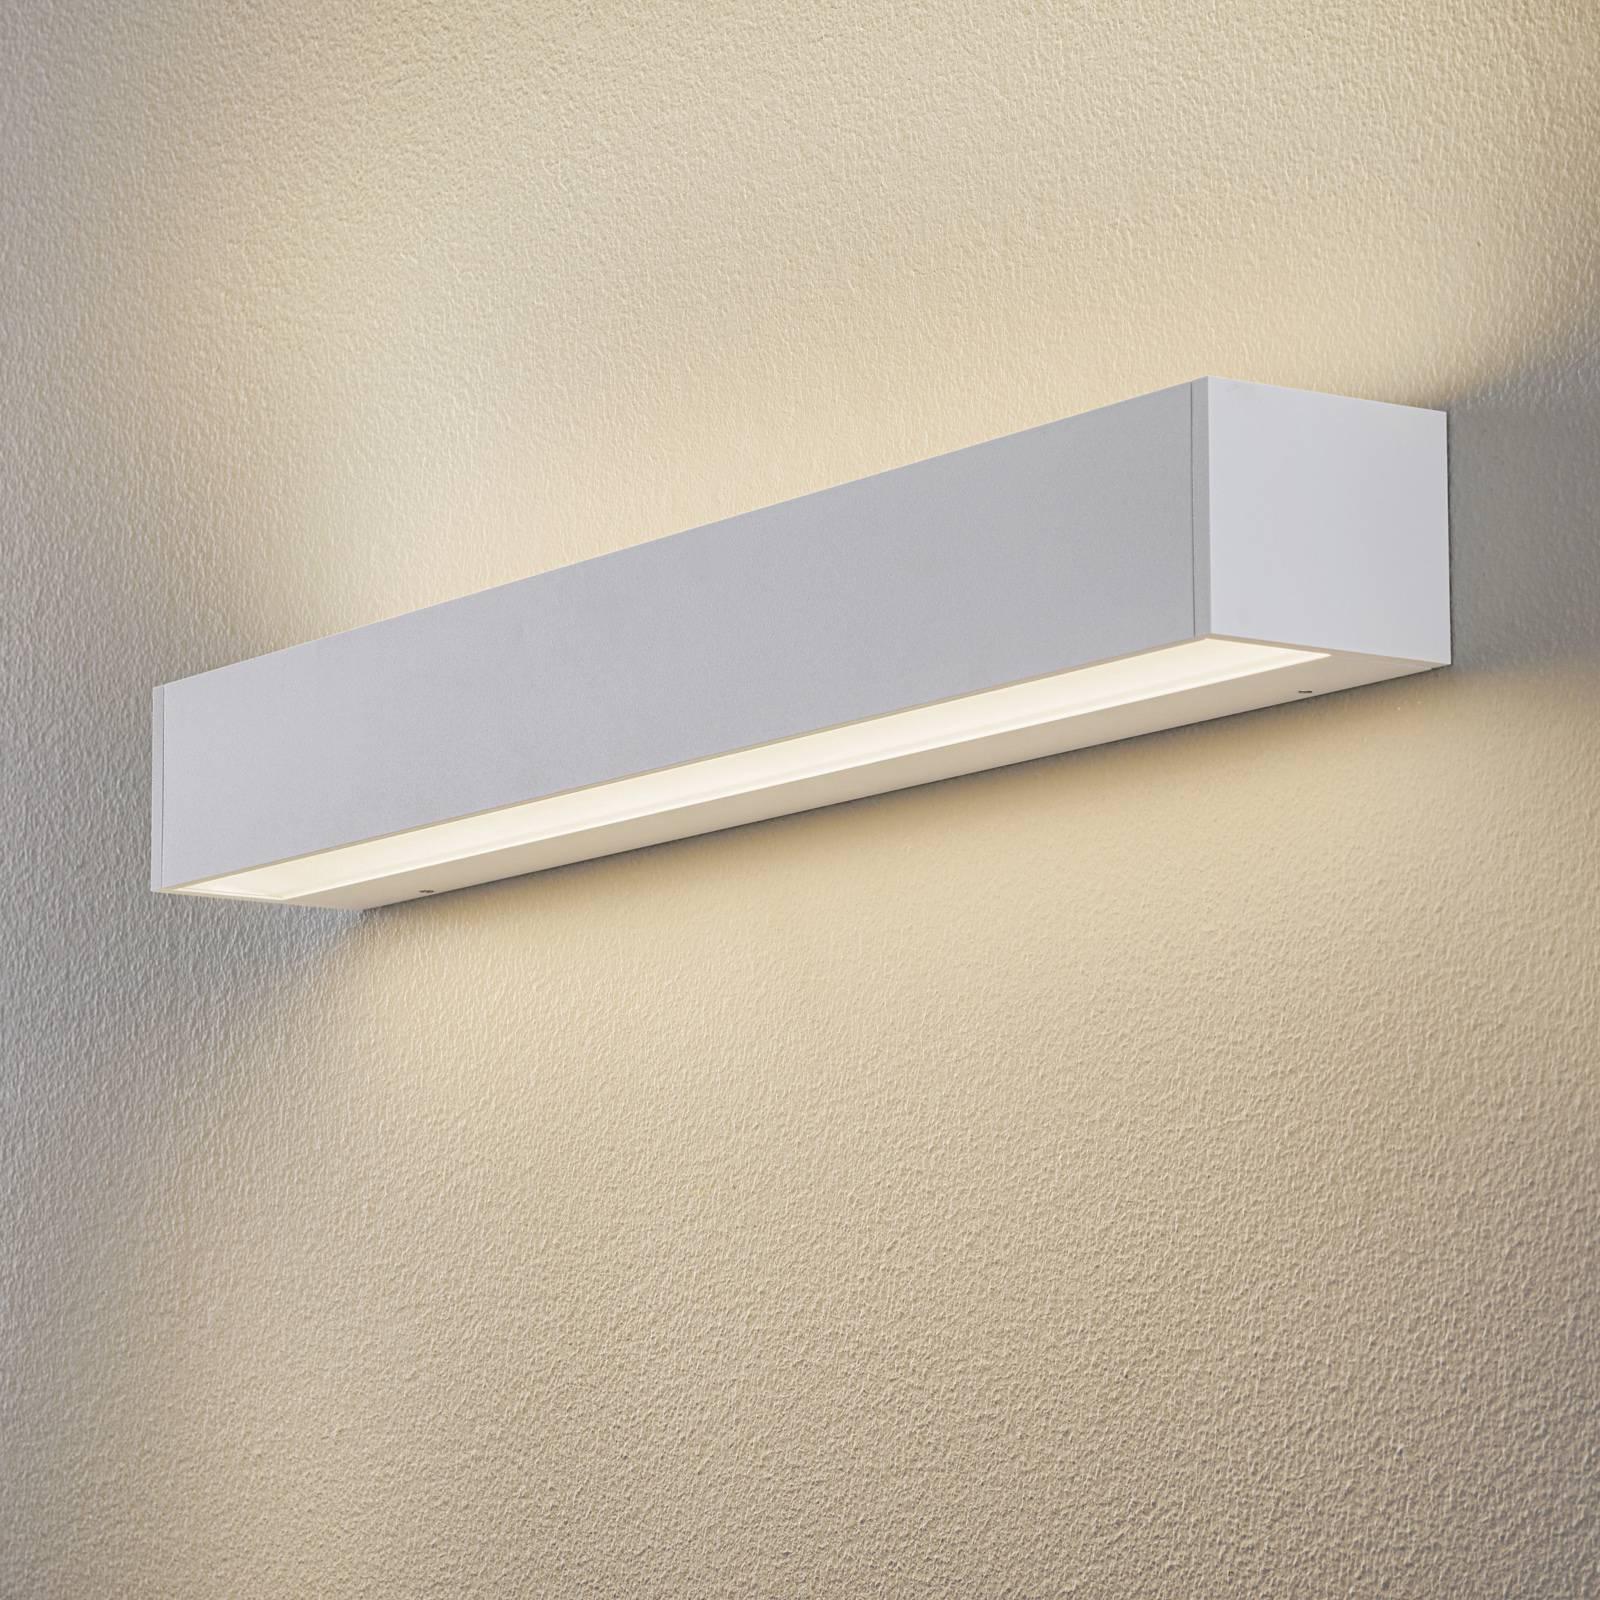 BEGA 50804 LED-seinälamppu valkoinen 62cm 6 180lm